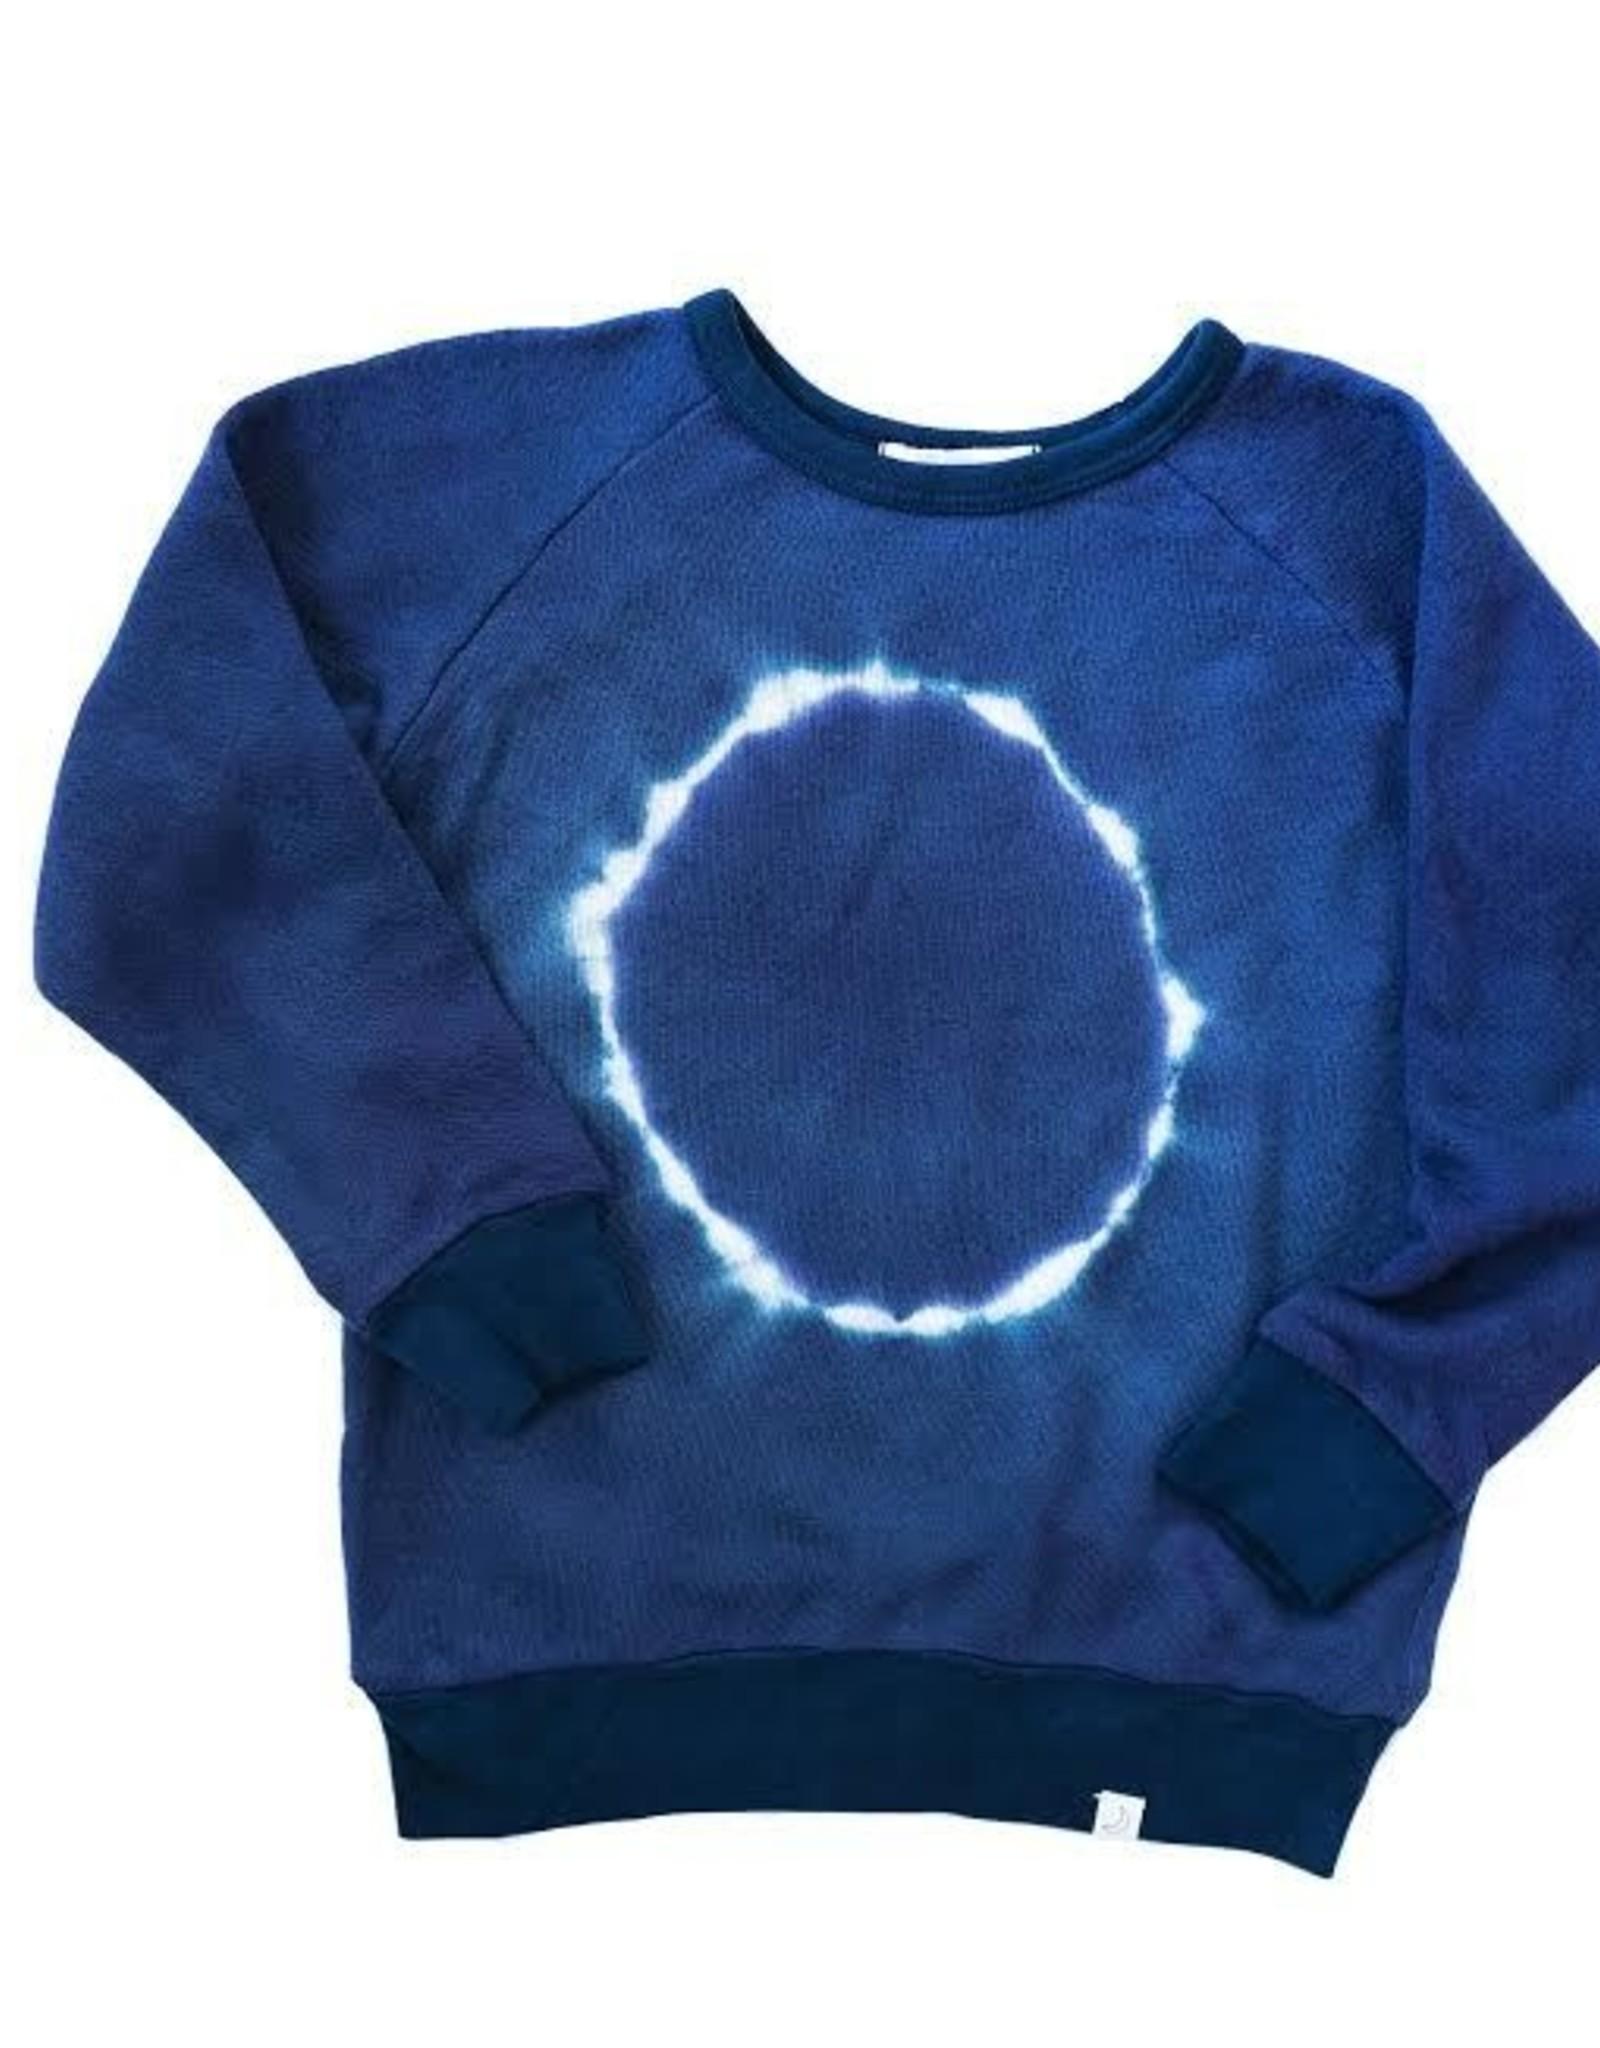 Little Moon Society emerson pullover- blue moon